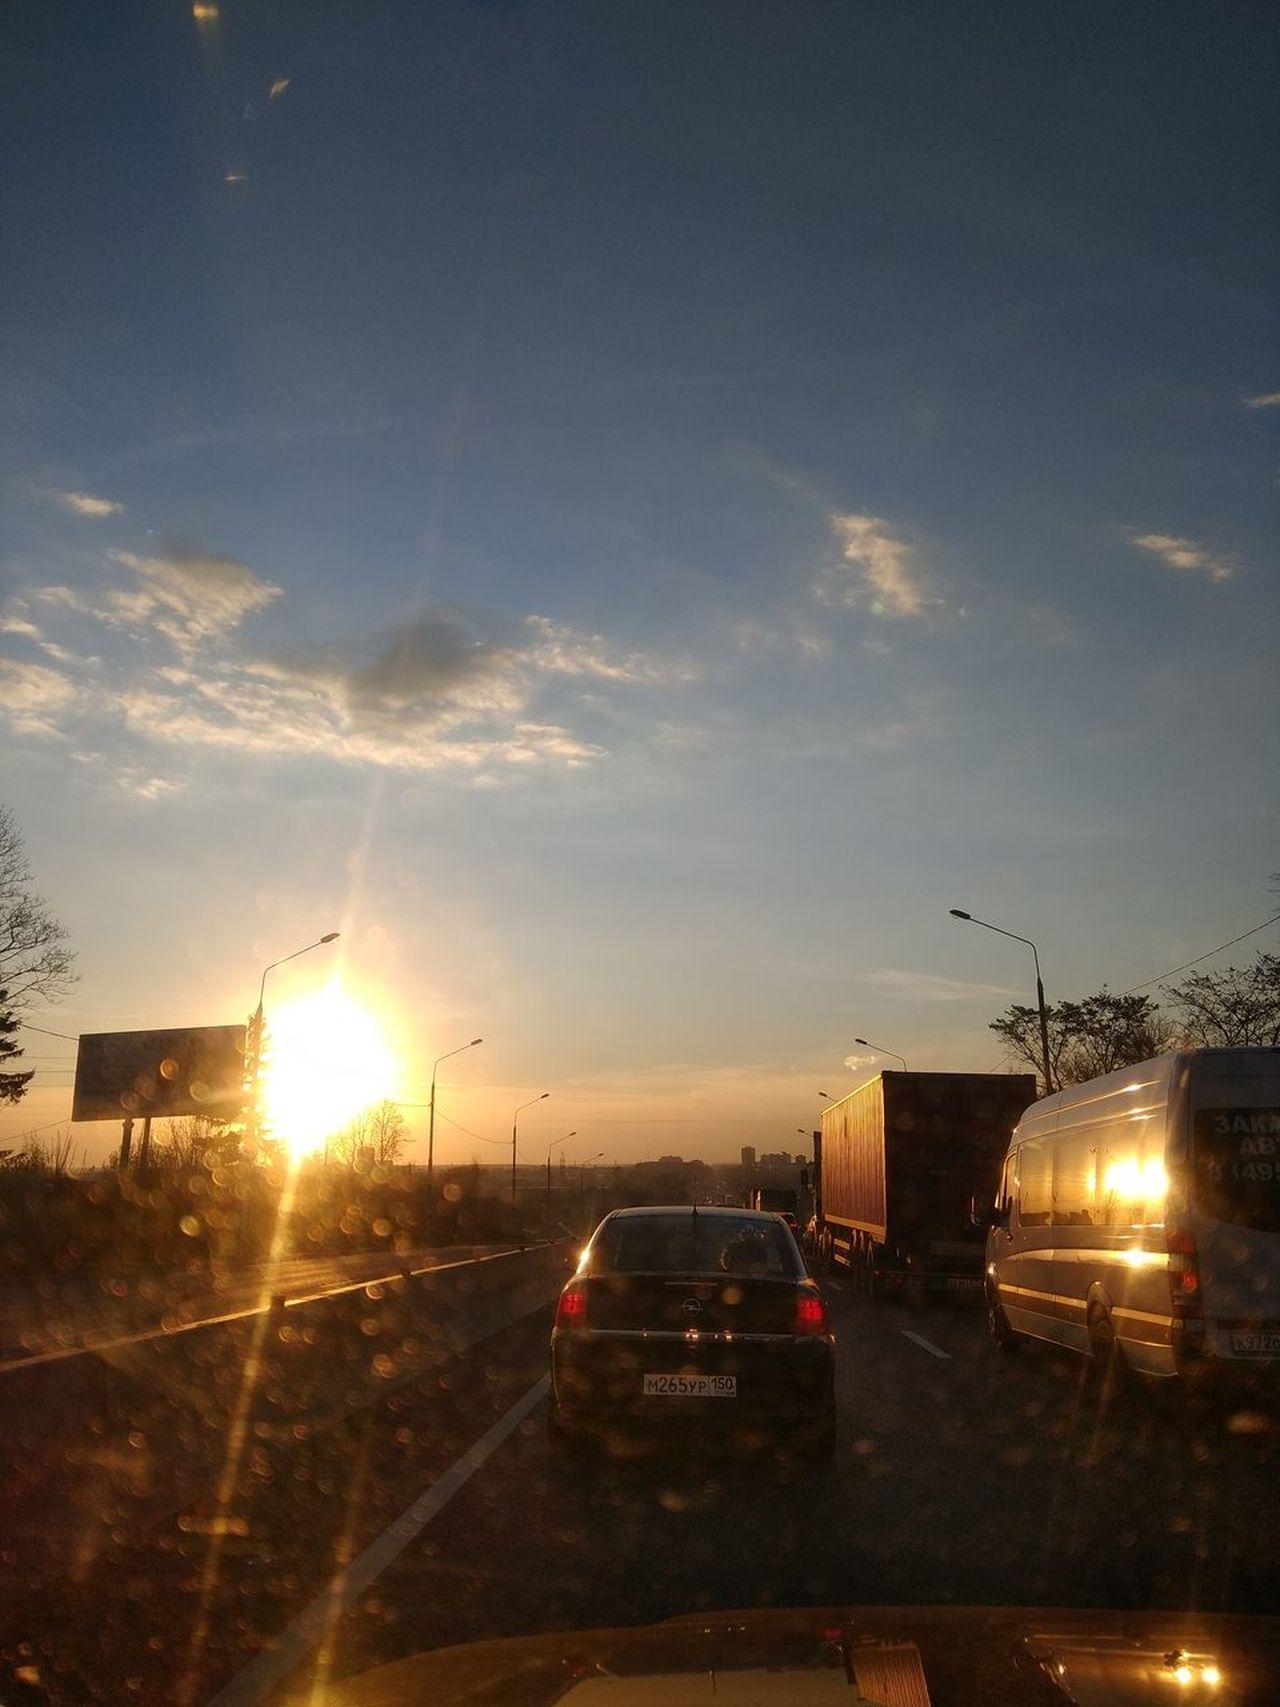 Sunset Outdoors Sky City Day Road Transportation Incar Automobile